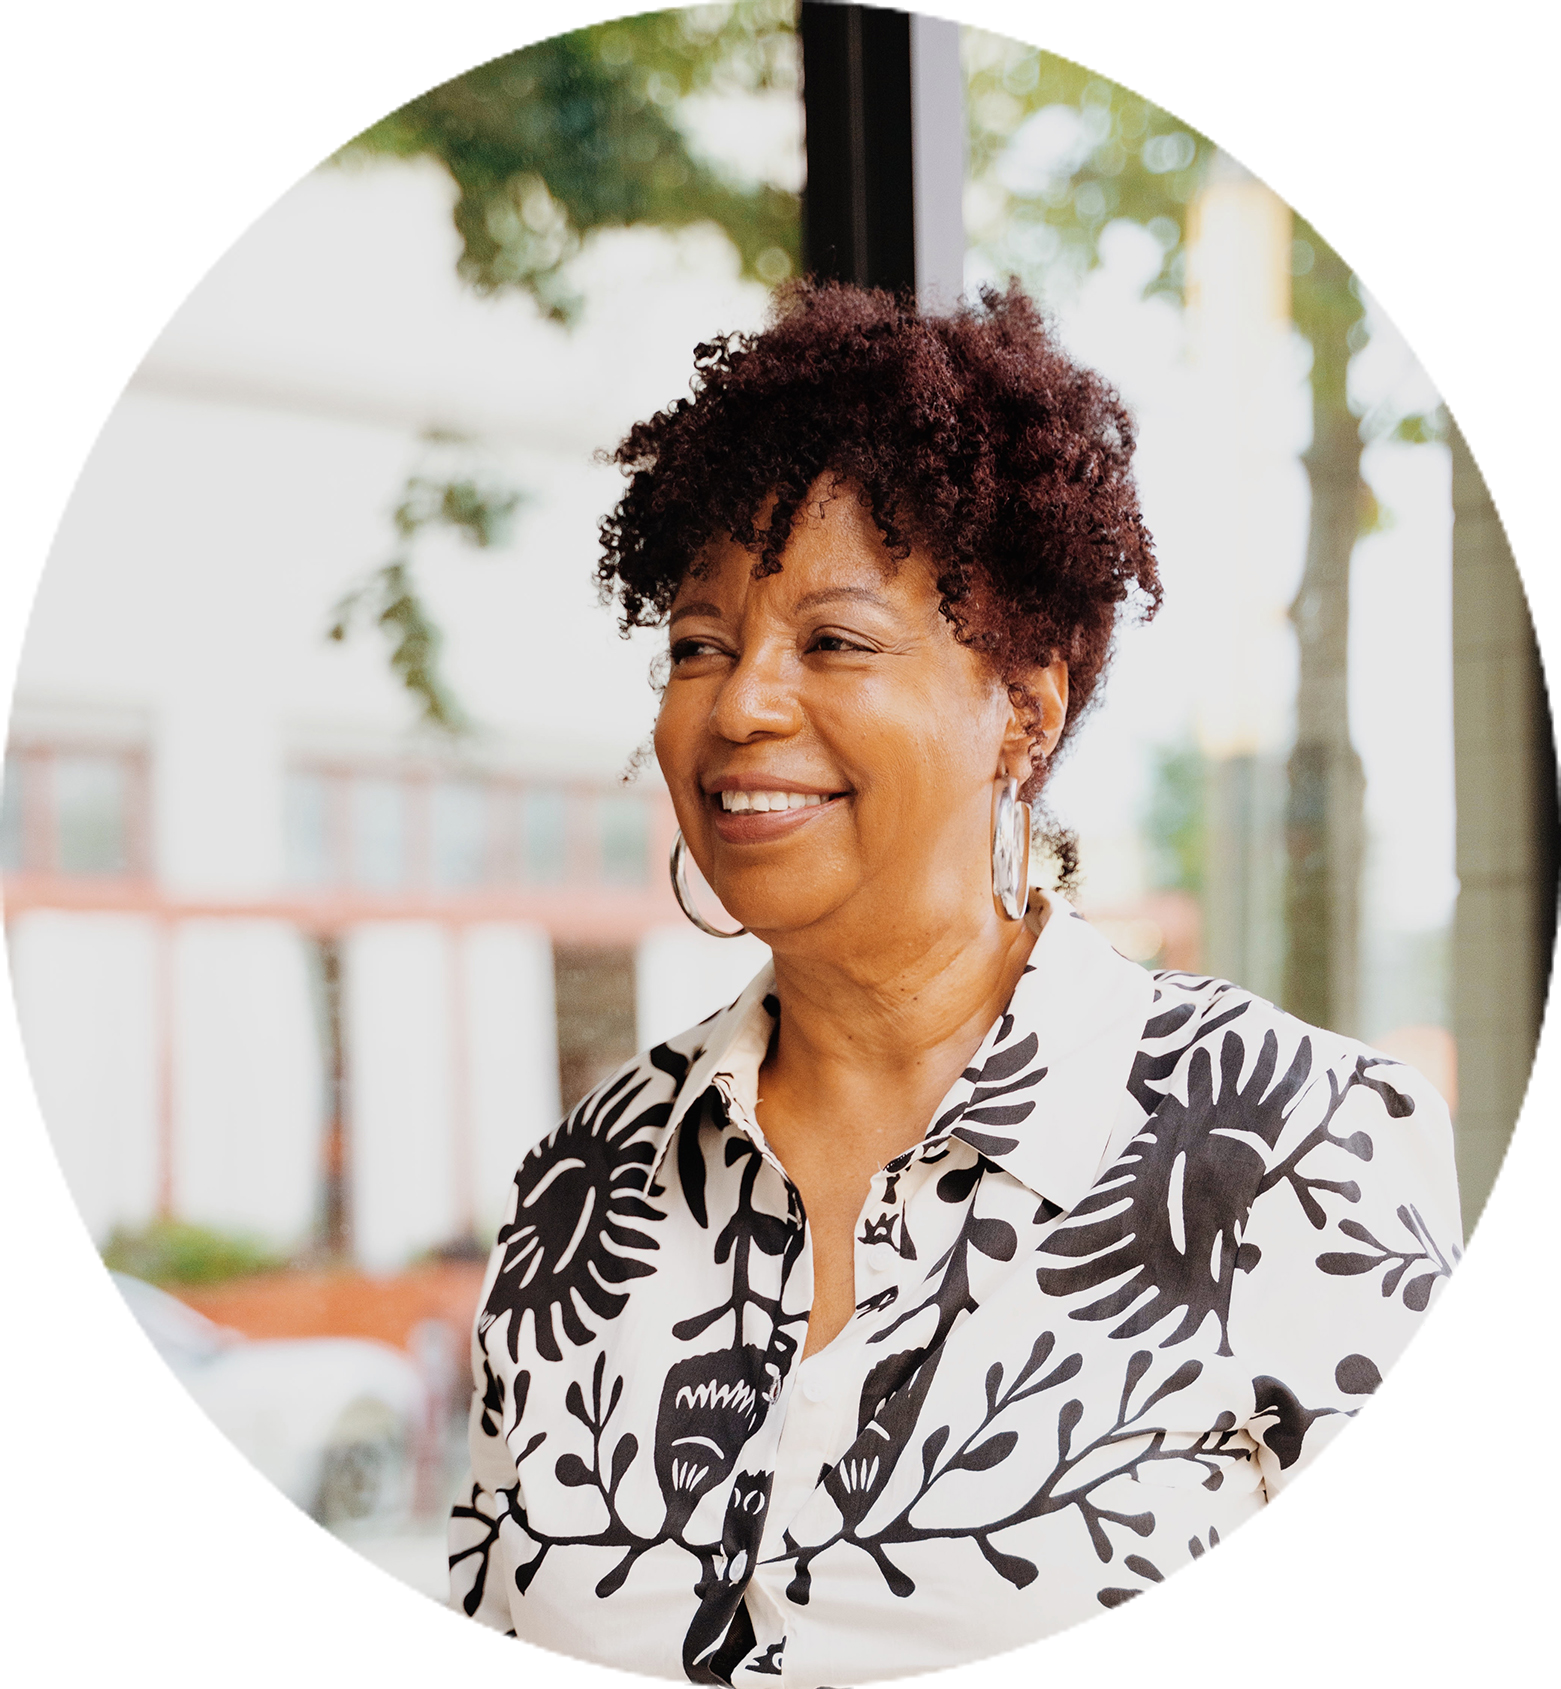 Image of Business Manager, Sheila Miller-Jackson